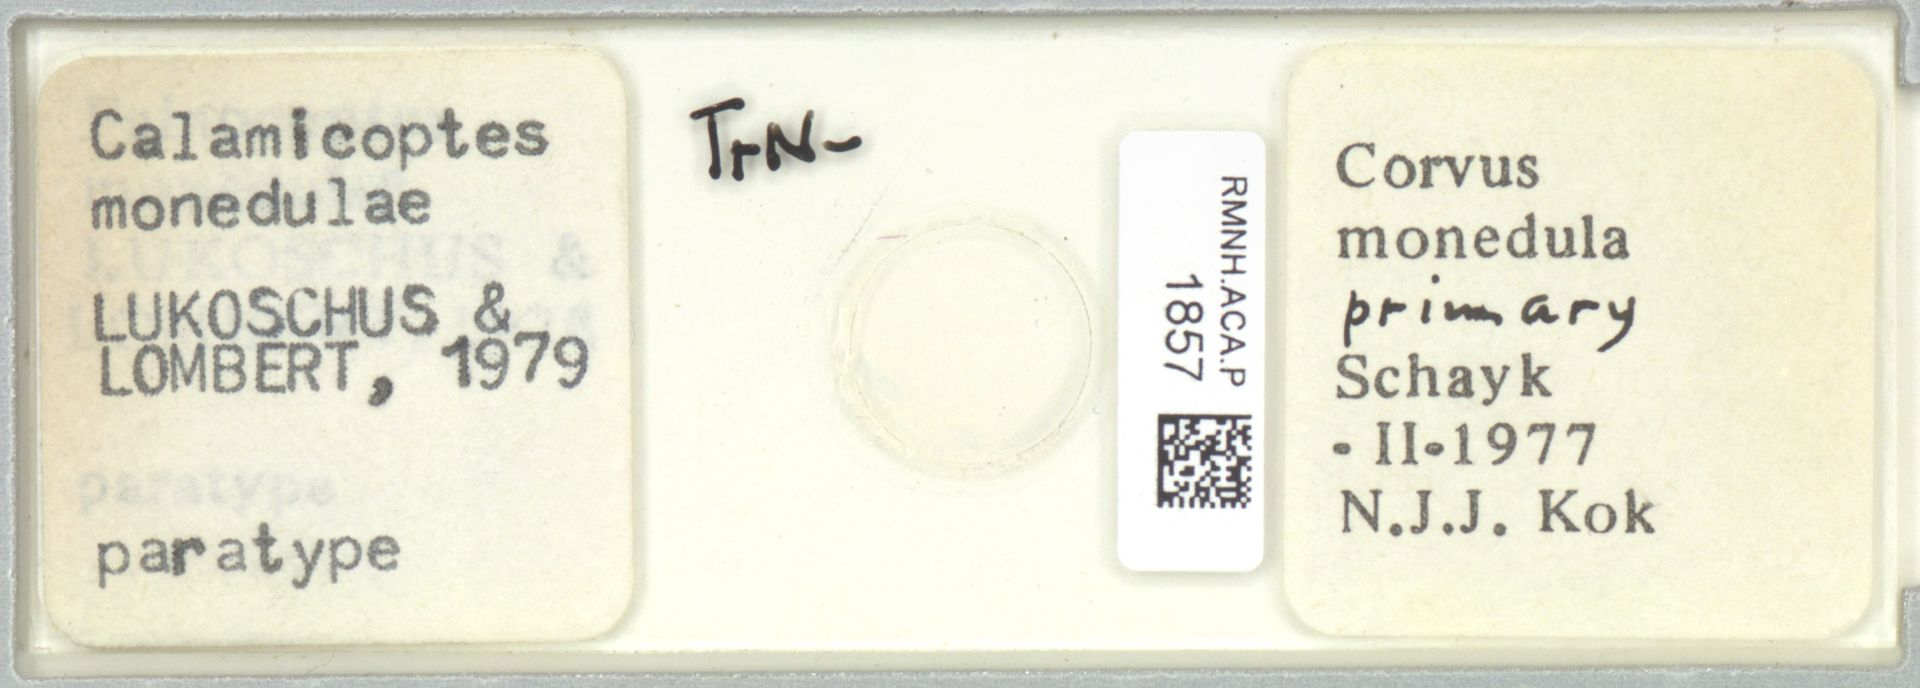 RMNH.ACA.P.1857 | Calamicoptes monedulae Lukoschus & Lombert, 1979